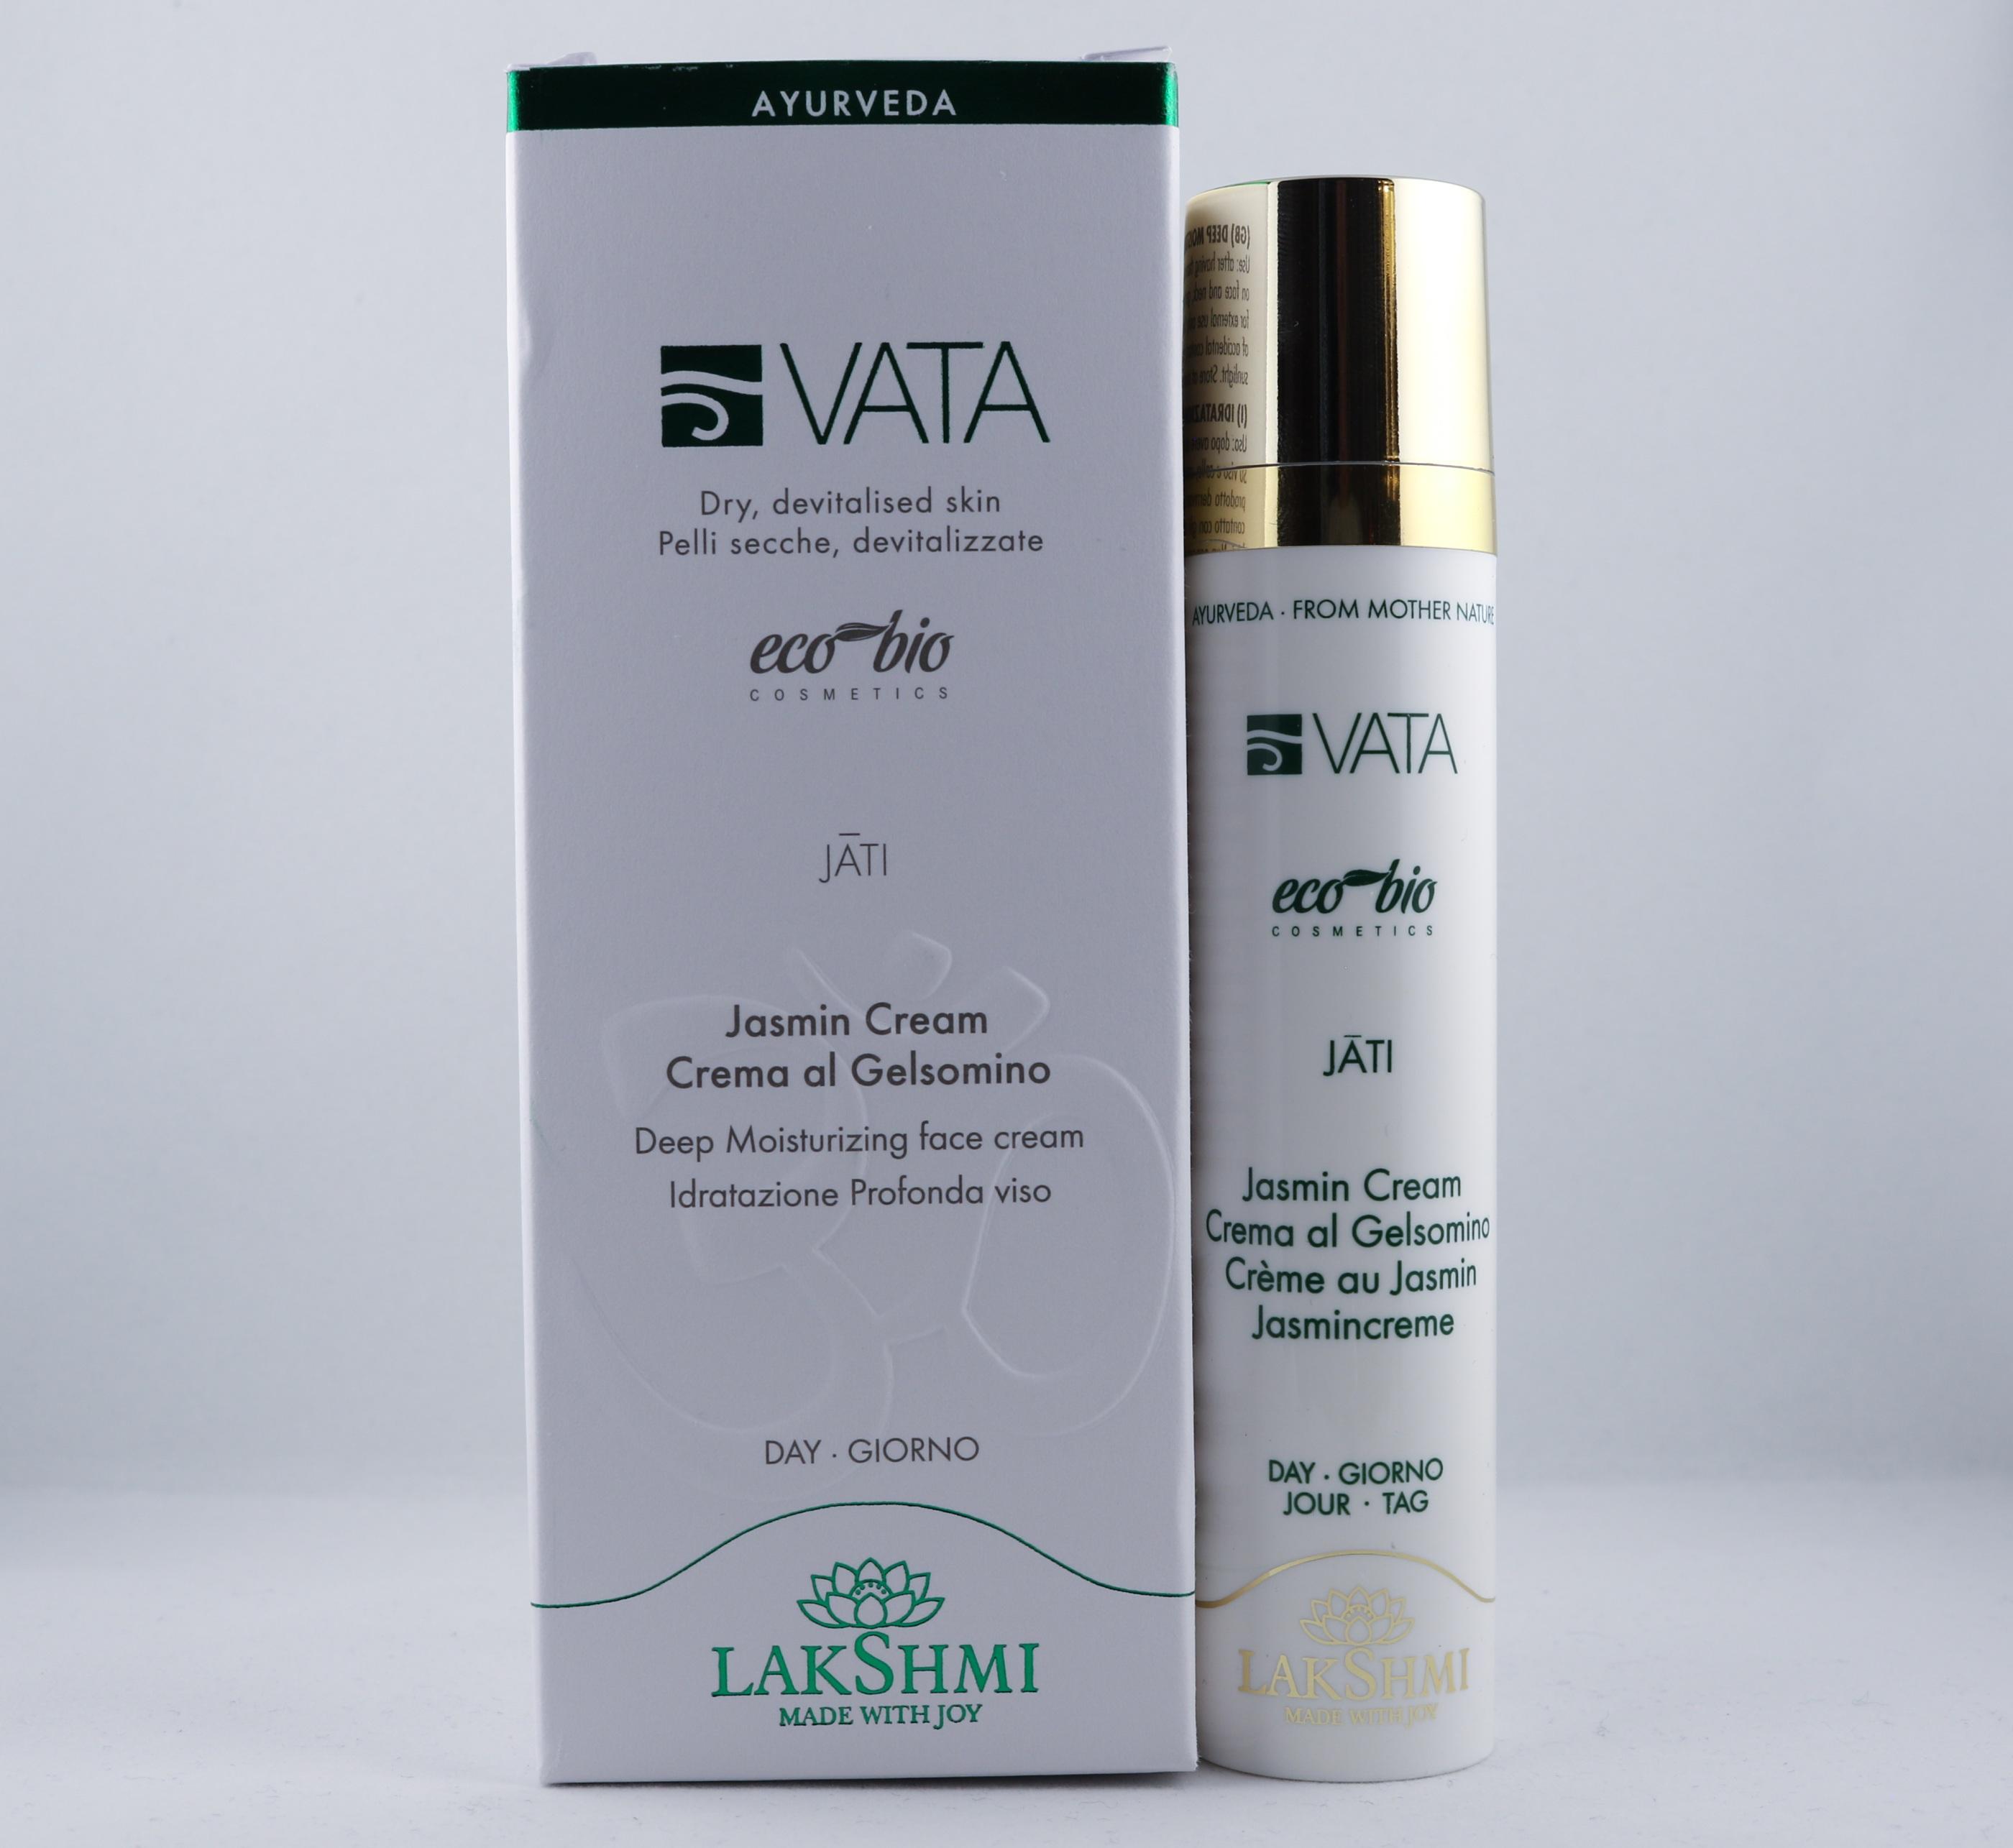 Vata Jasmine Cream hudvårdsprodukt hudvårdstyp alternativ hälsa wellness ayurveda ansikte